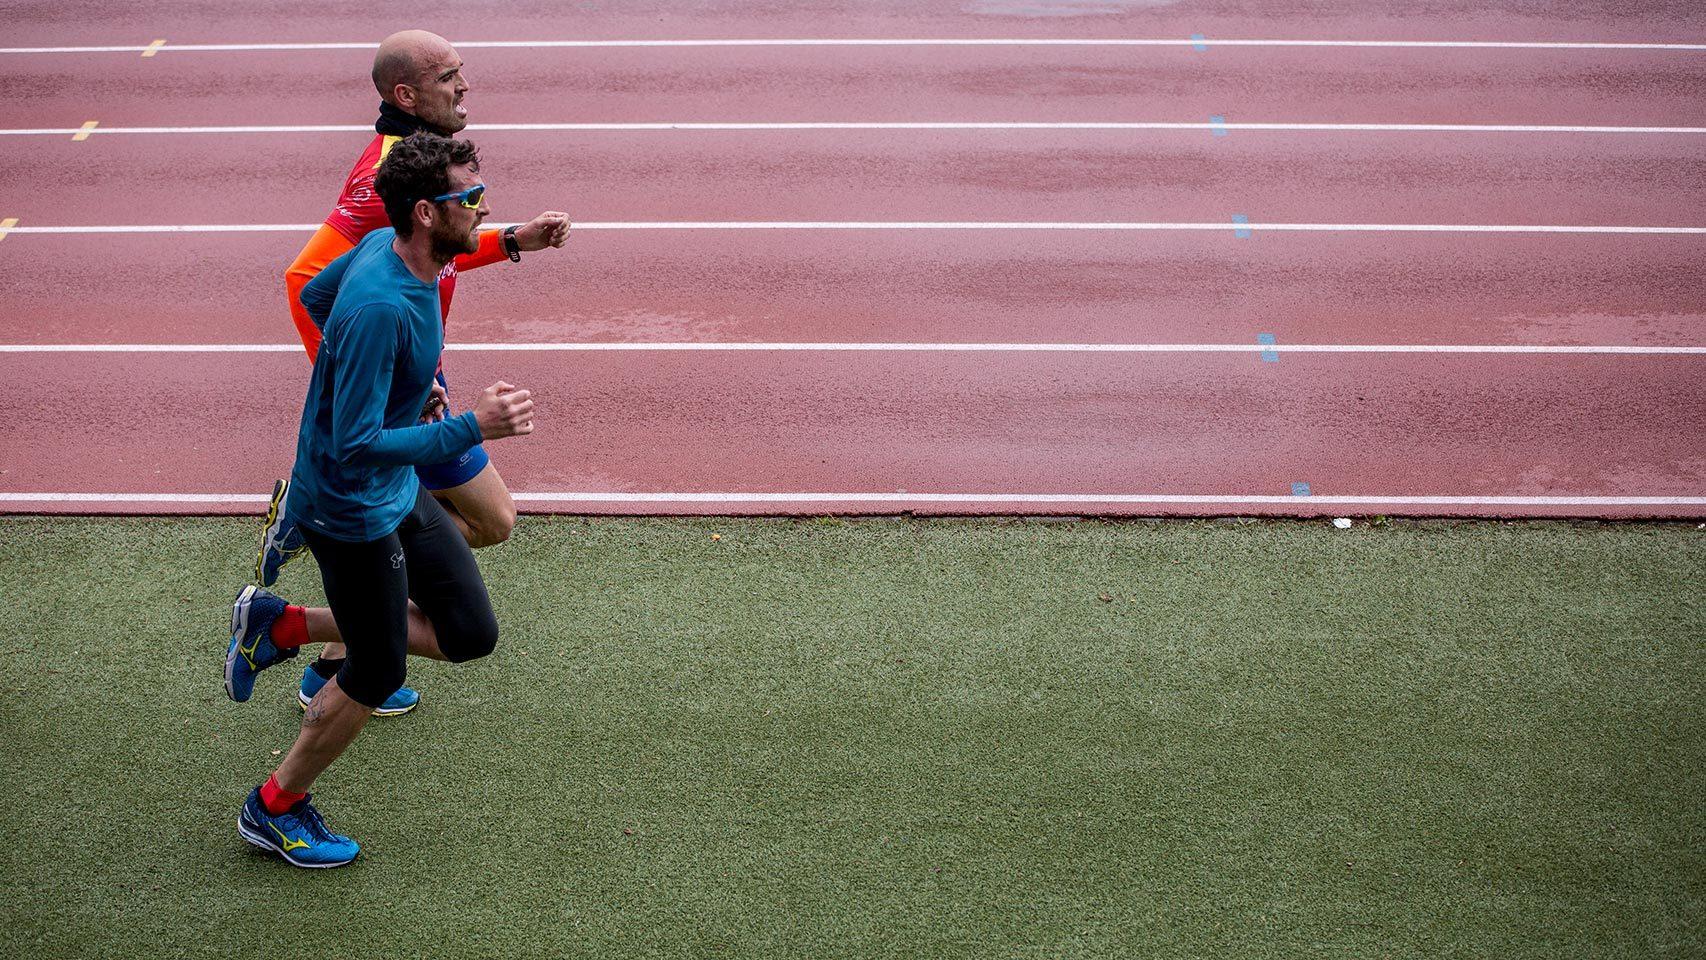 Jota y Nacho corren perfectamente coordinados, paso a paso.